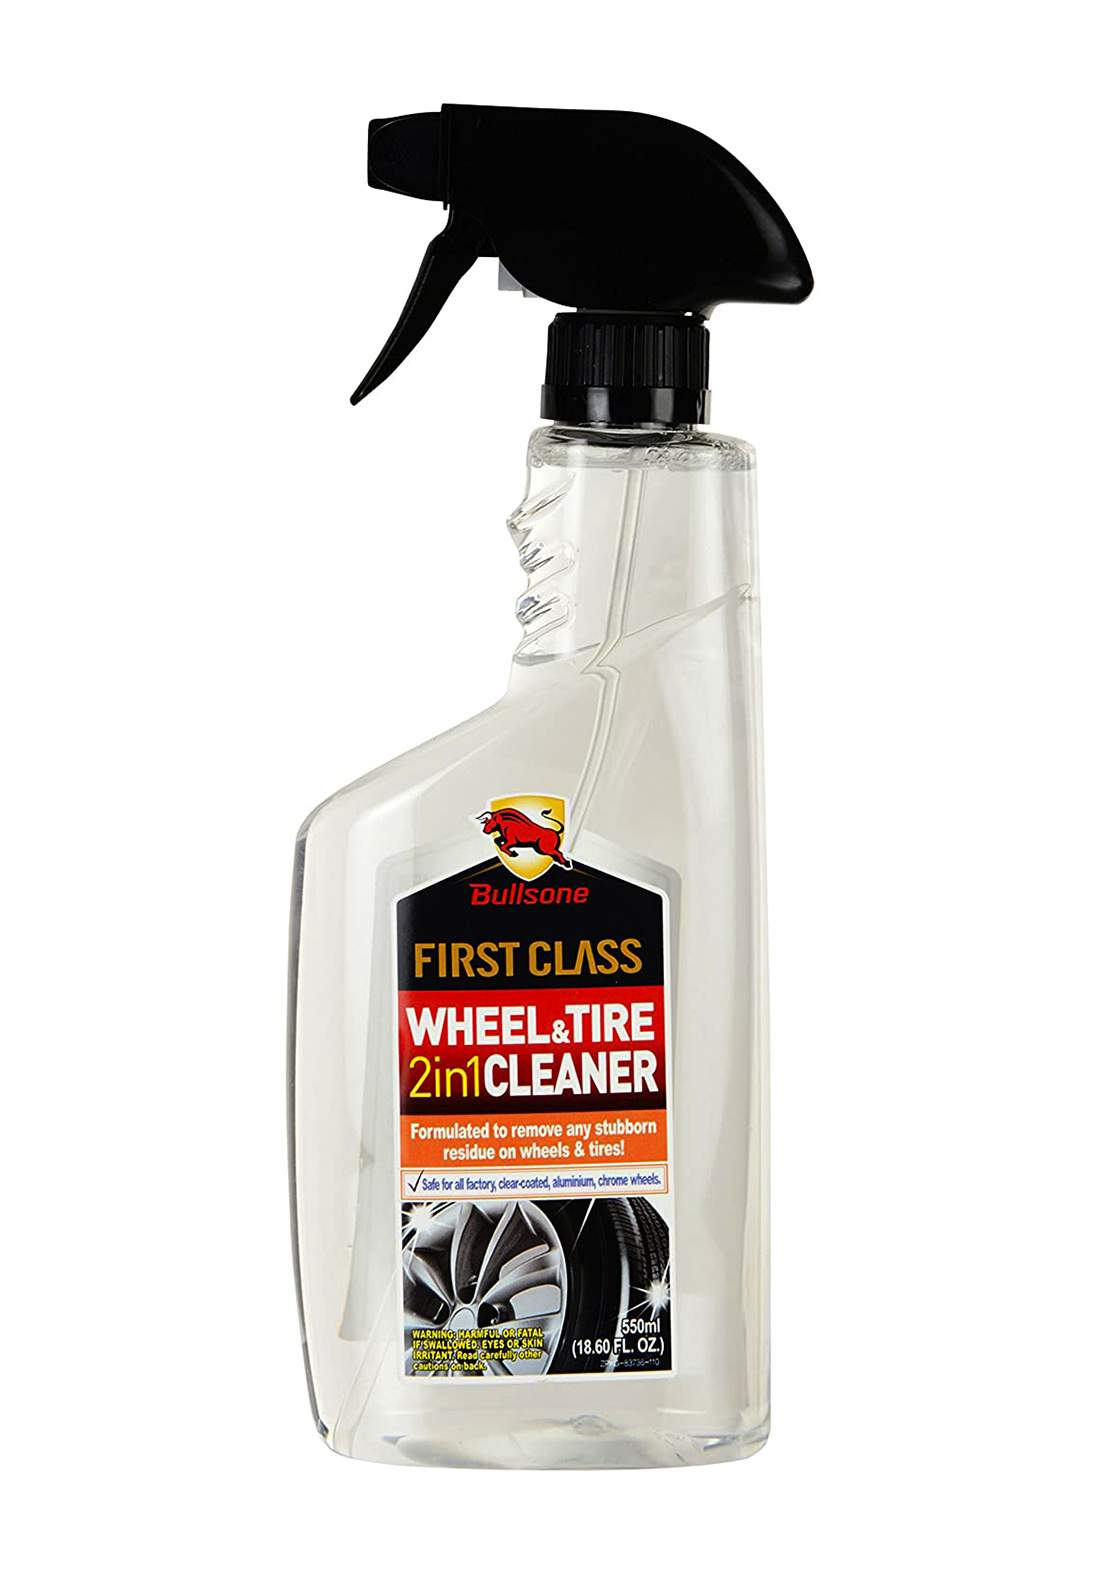 Bullsone Firstclass 2 In 1 Wheel and Tyre Cleaner 550 ml منظف الإطارات والعجلات